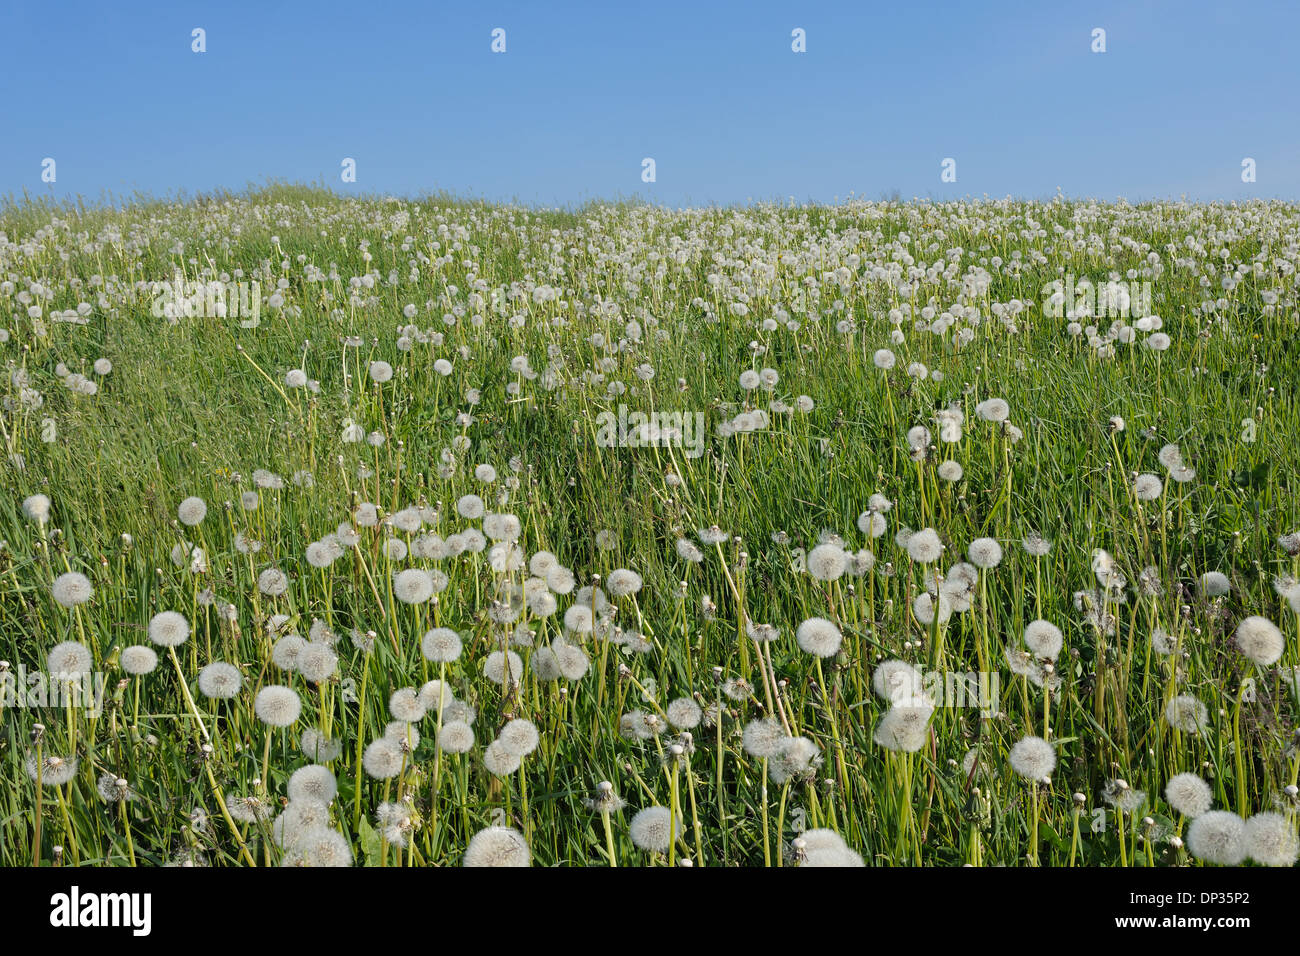 Dandelion (Taraxacum officinale) Clocks in Meadow, Switzerland Stock Photo